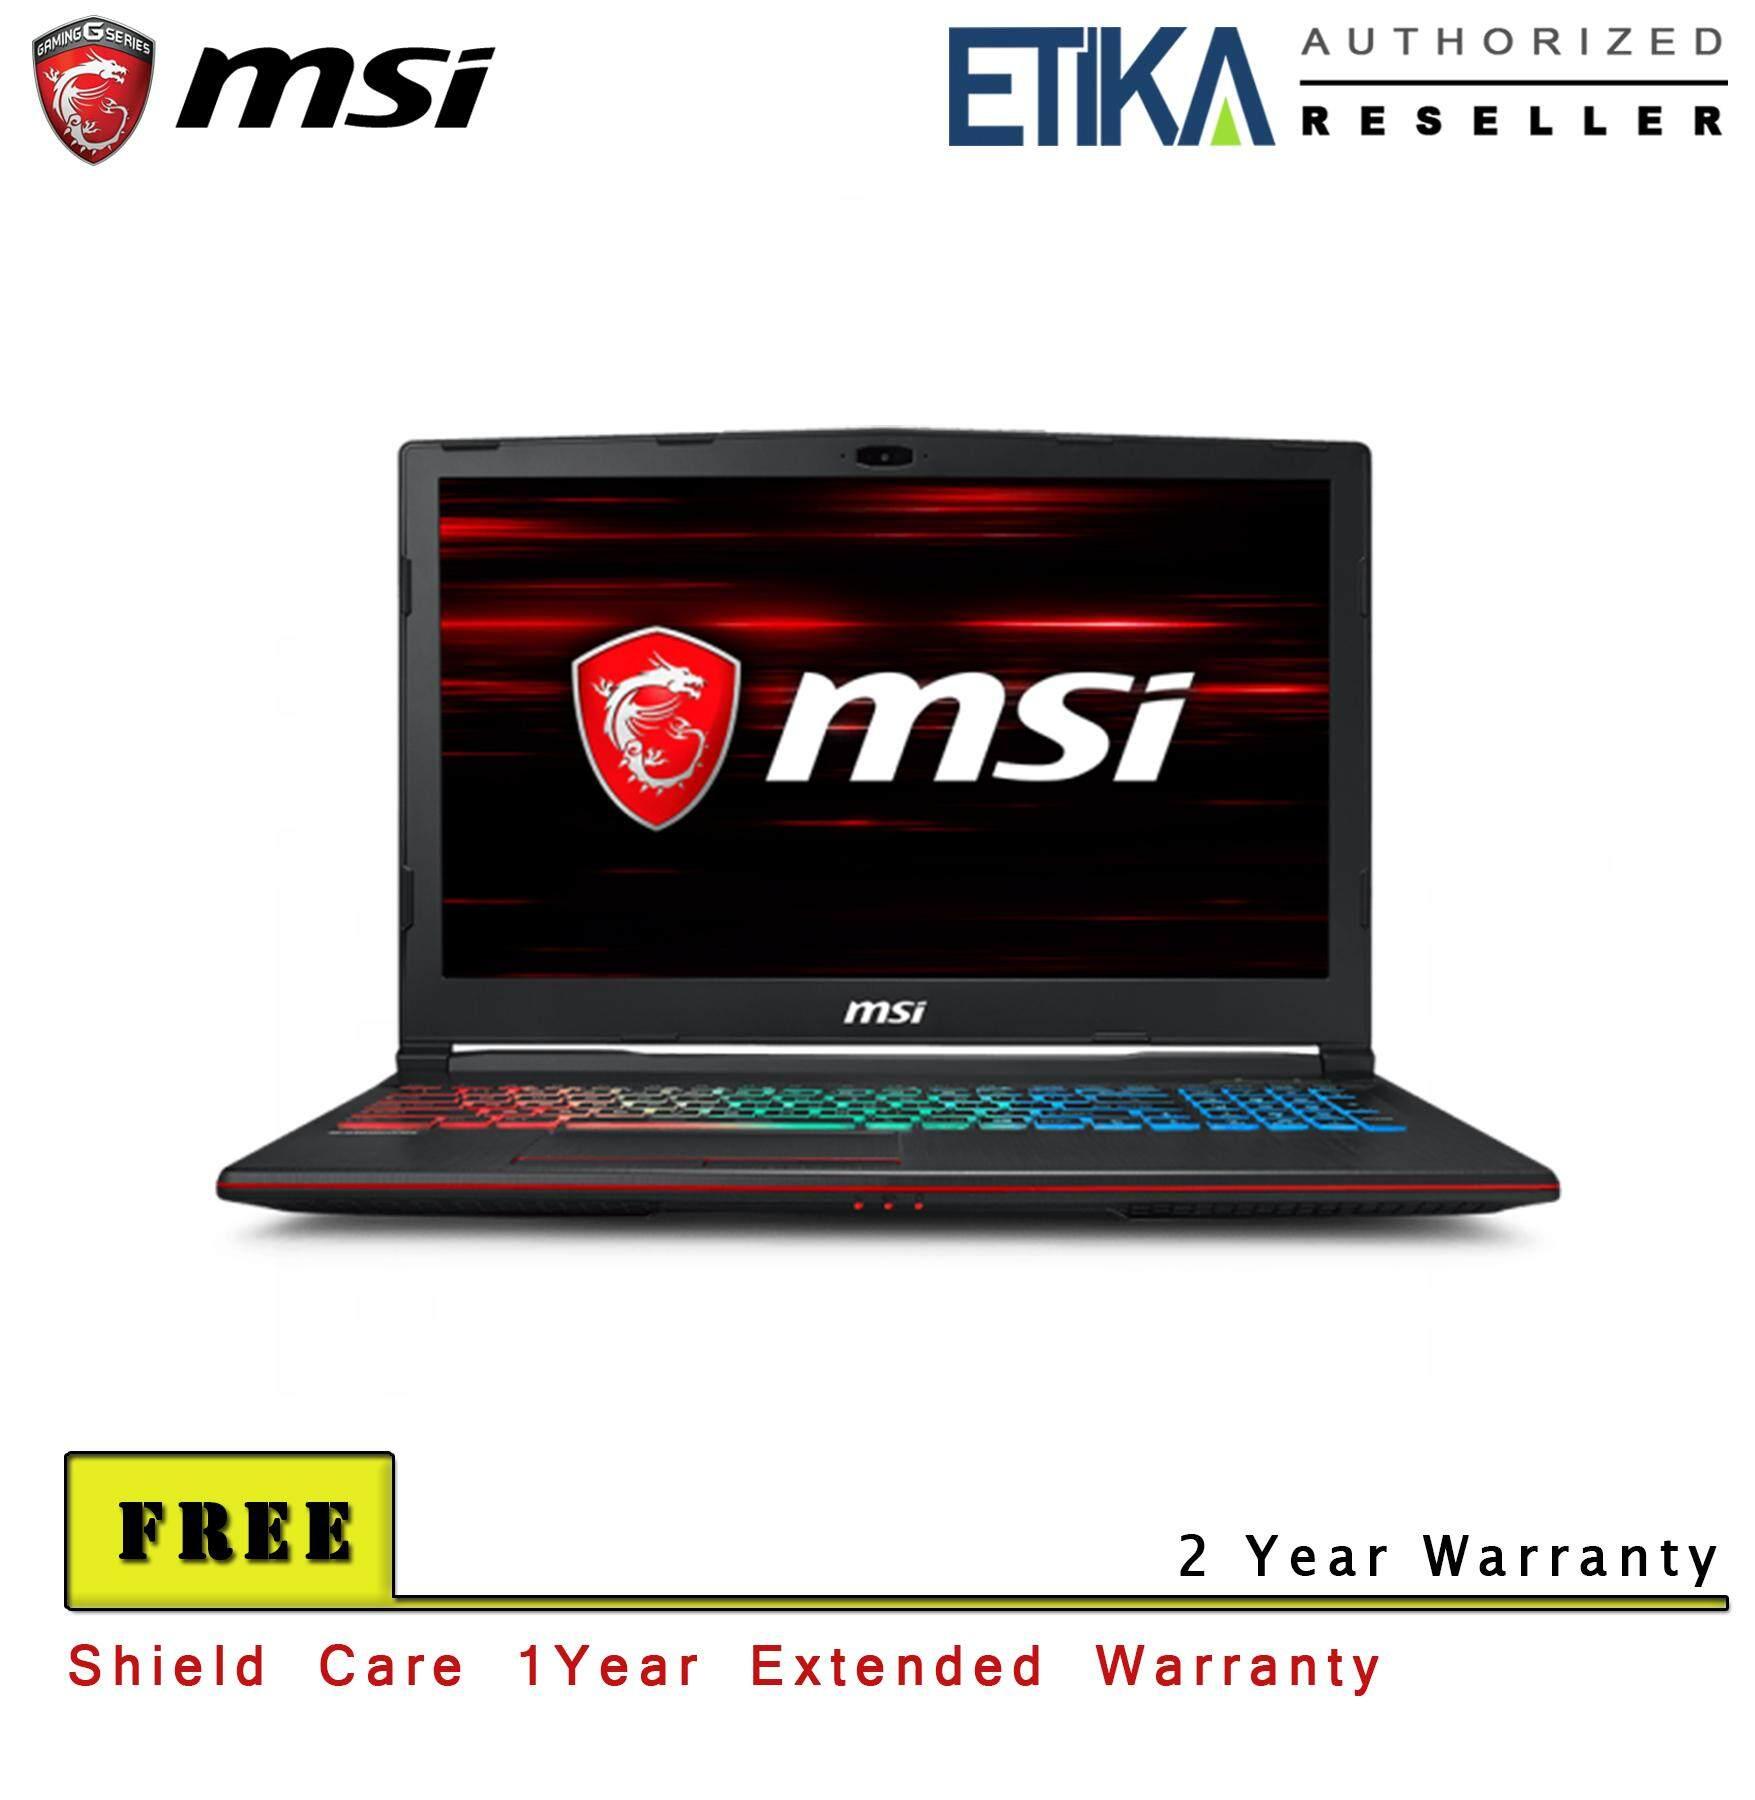 MSI GP63 Leopard 8RD 409 (GeForce GTX 1050 Ti, 4GB GDDR5) Gaming Laptop - Free Shieldcare + Backpack Malaysia